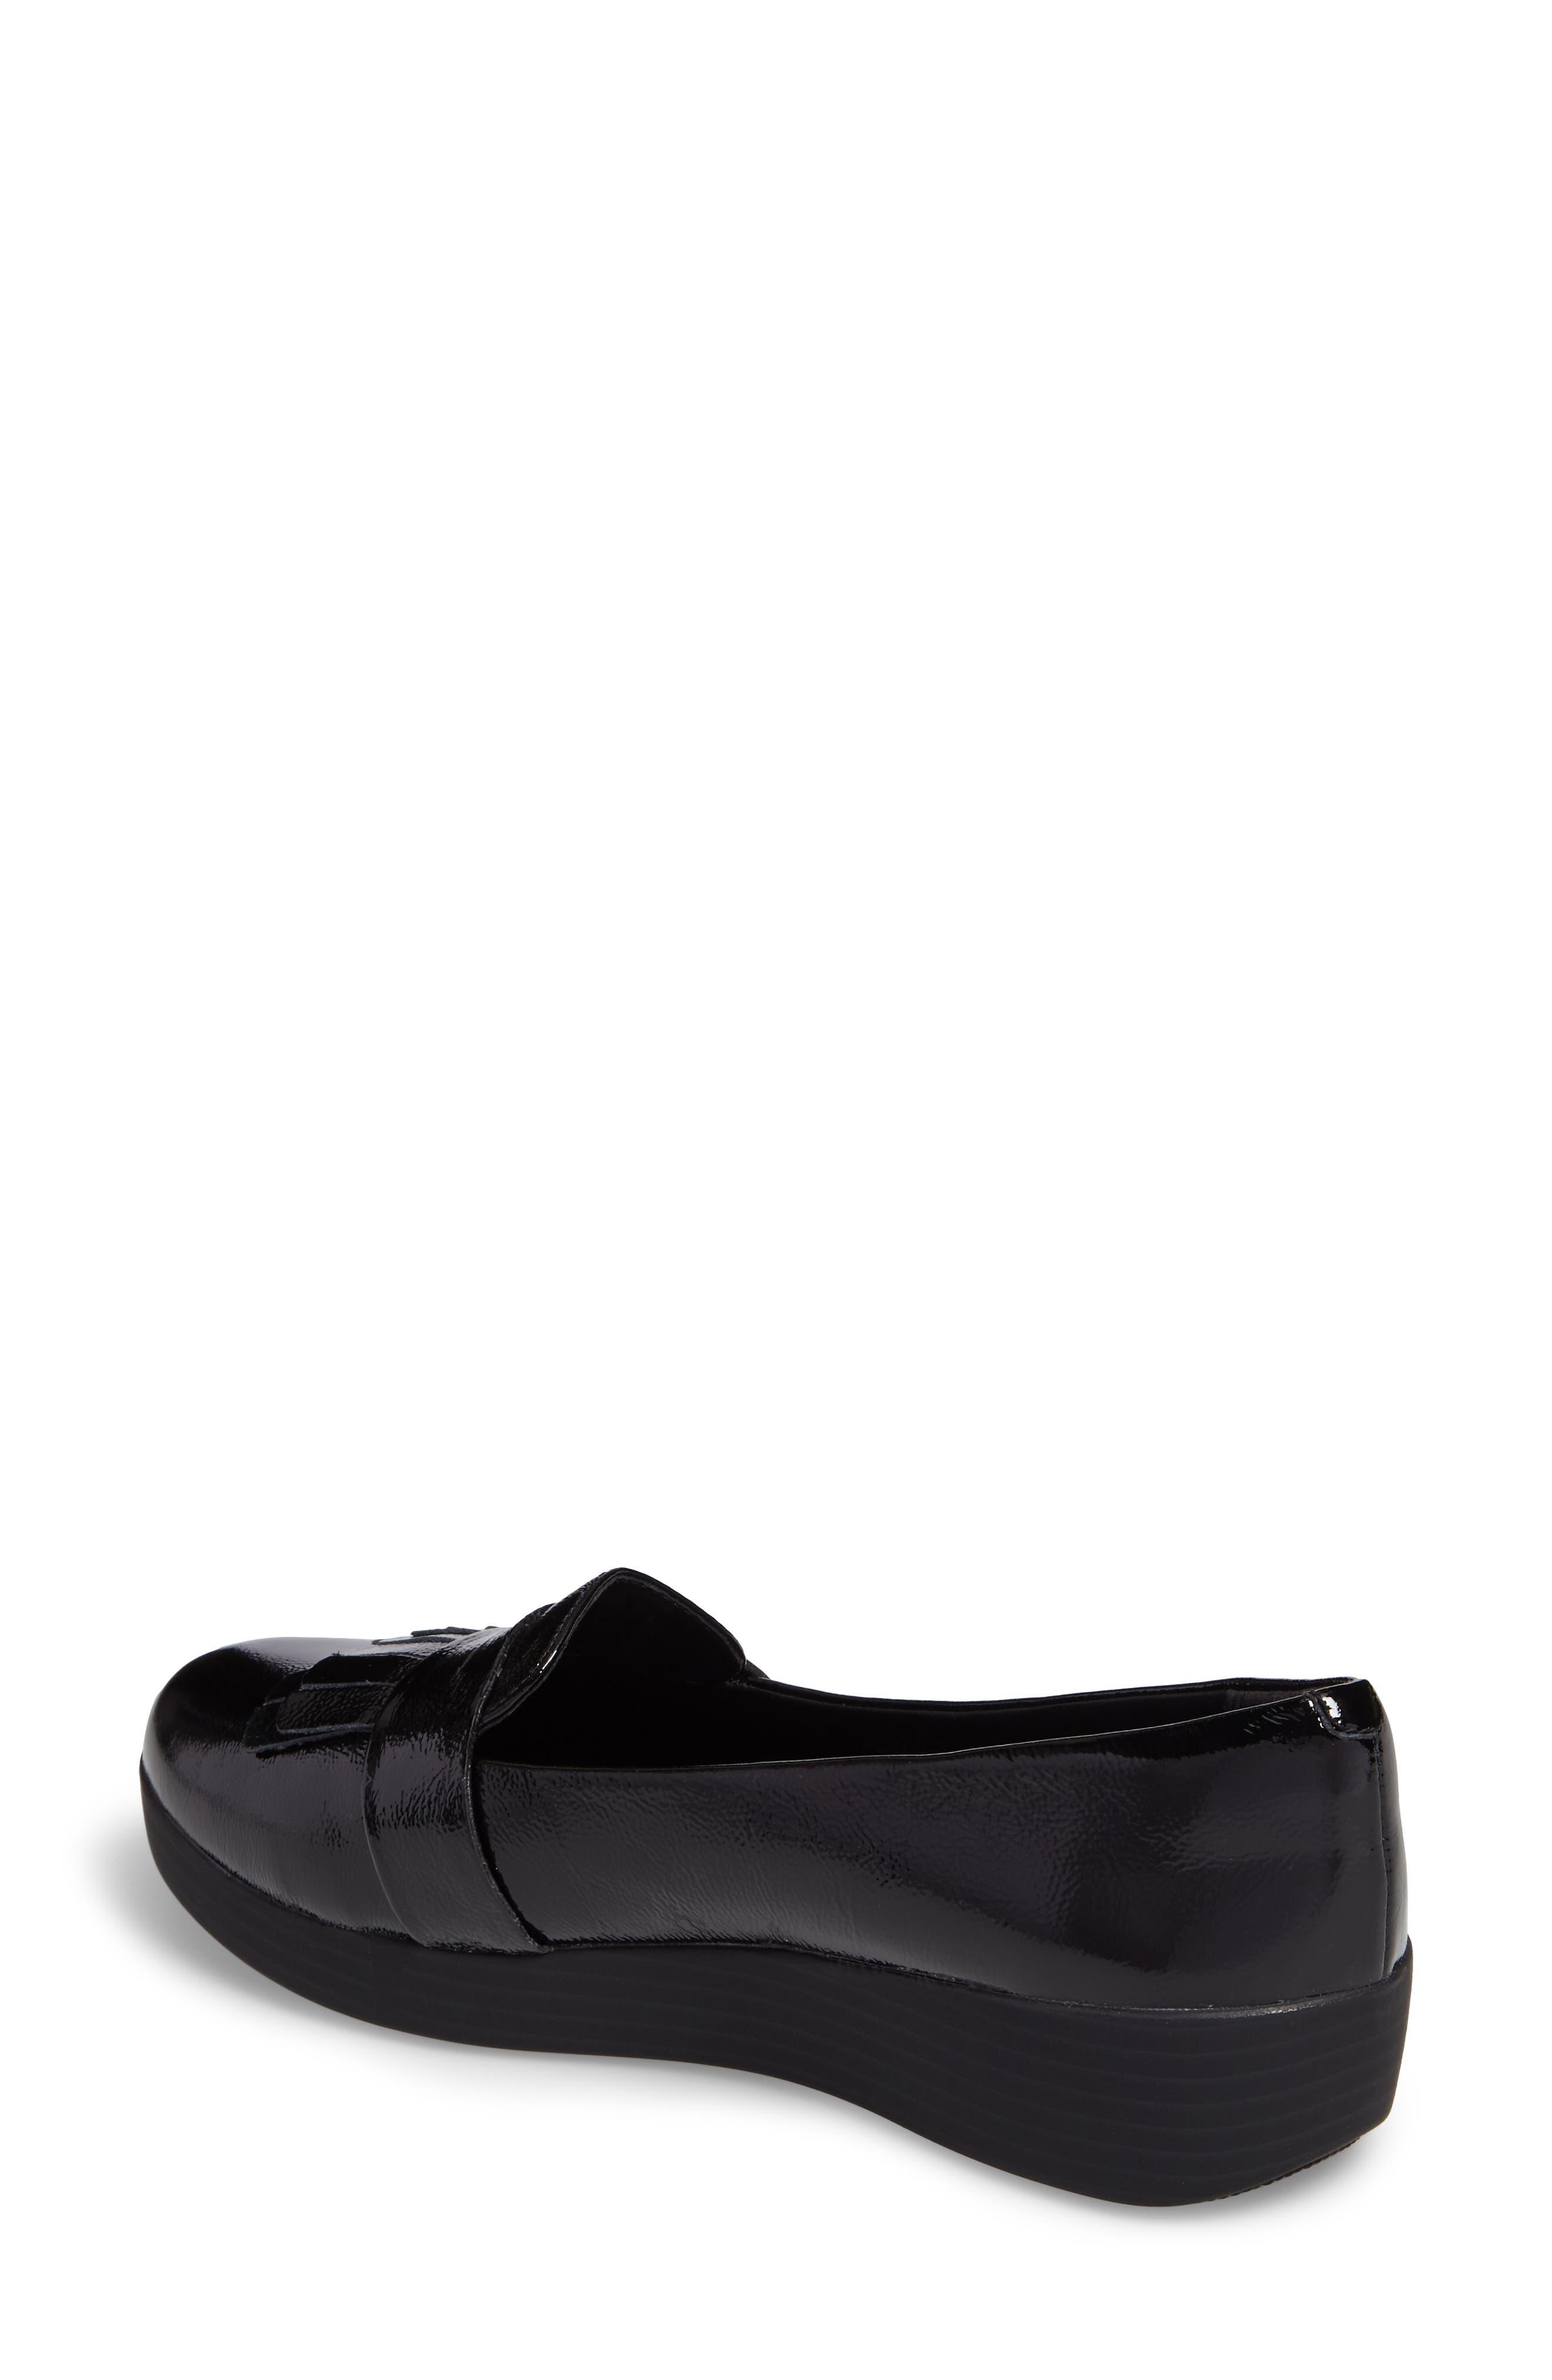 Alternate Image 2  - FitFlop™ Fringey Sneakerloafer Slip-On (Women)